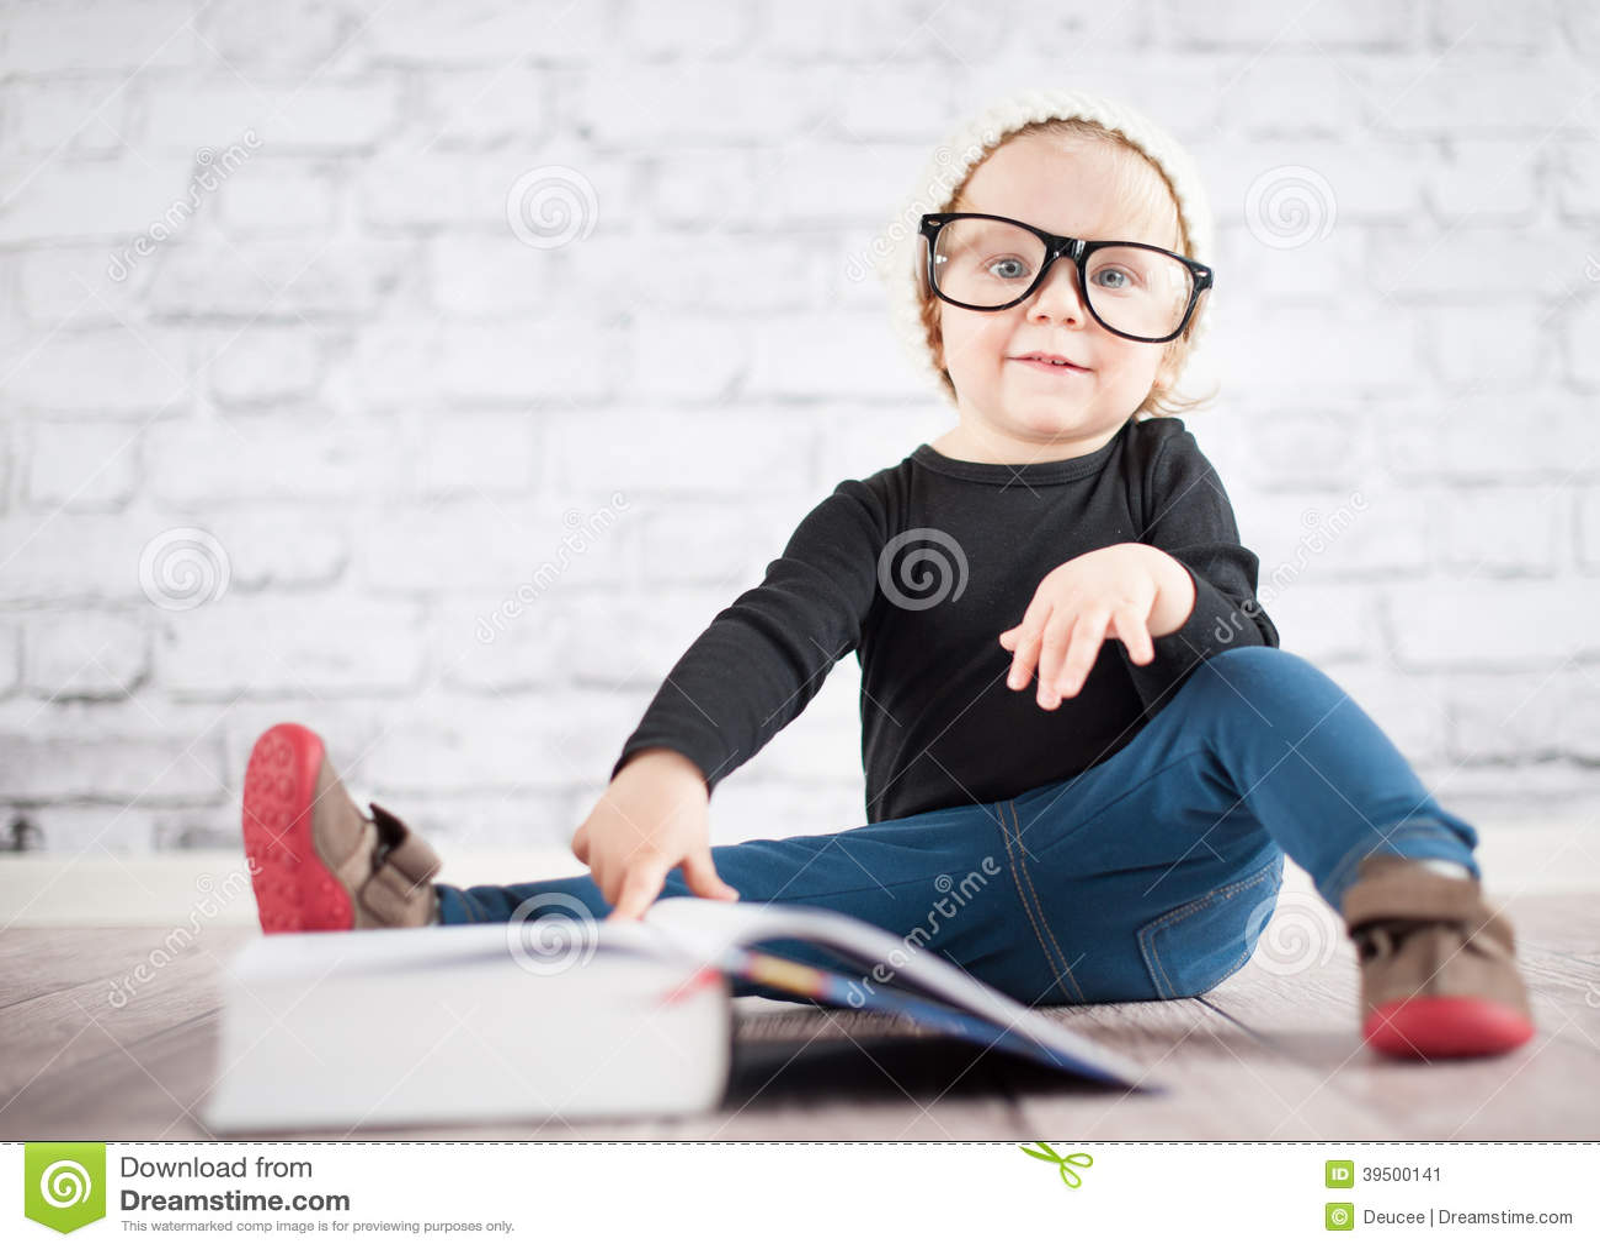 Study hard with nerd glasses